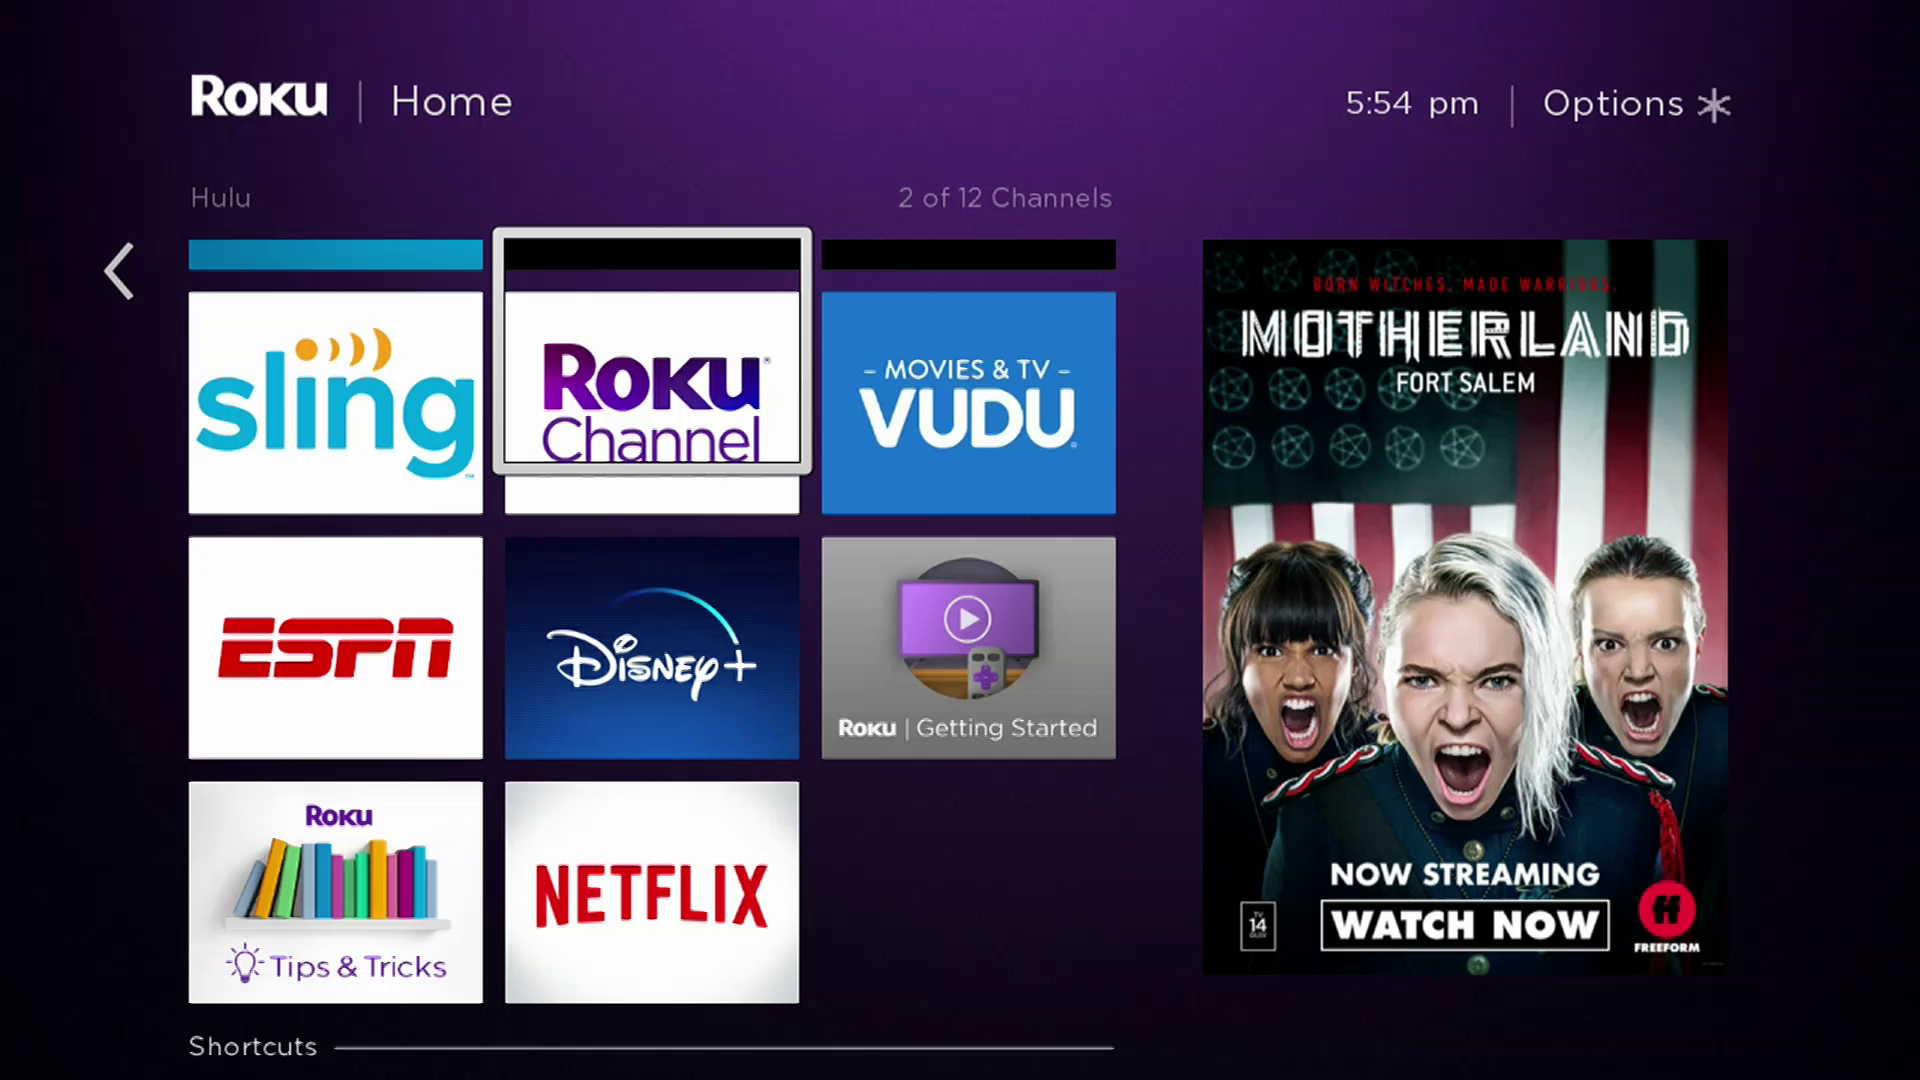 How To Get Netflix On Roku